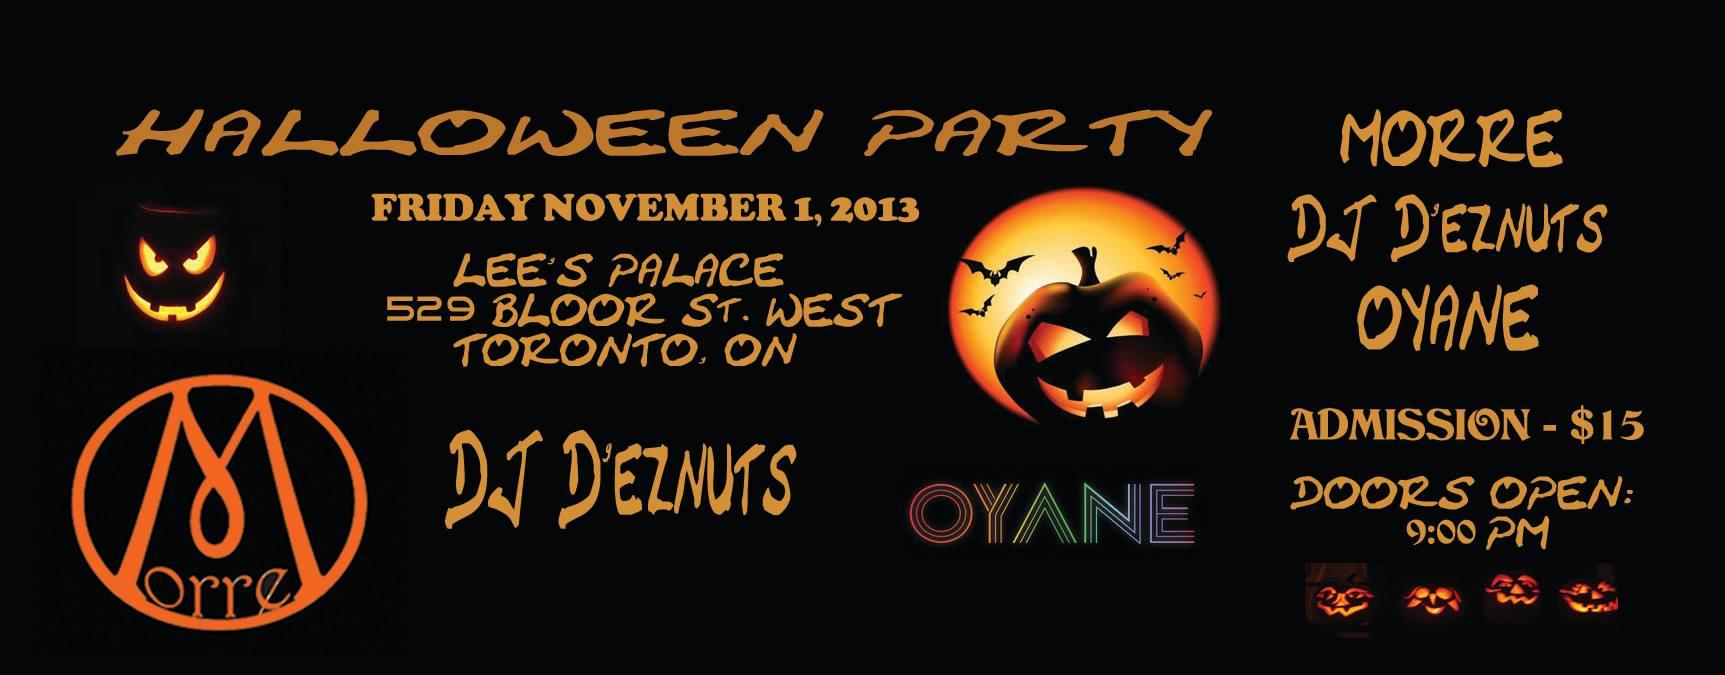 Halloween 1 November.Halloween Party W Morre Lee S Palace Toronto Nov 1